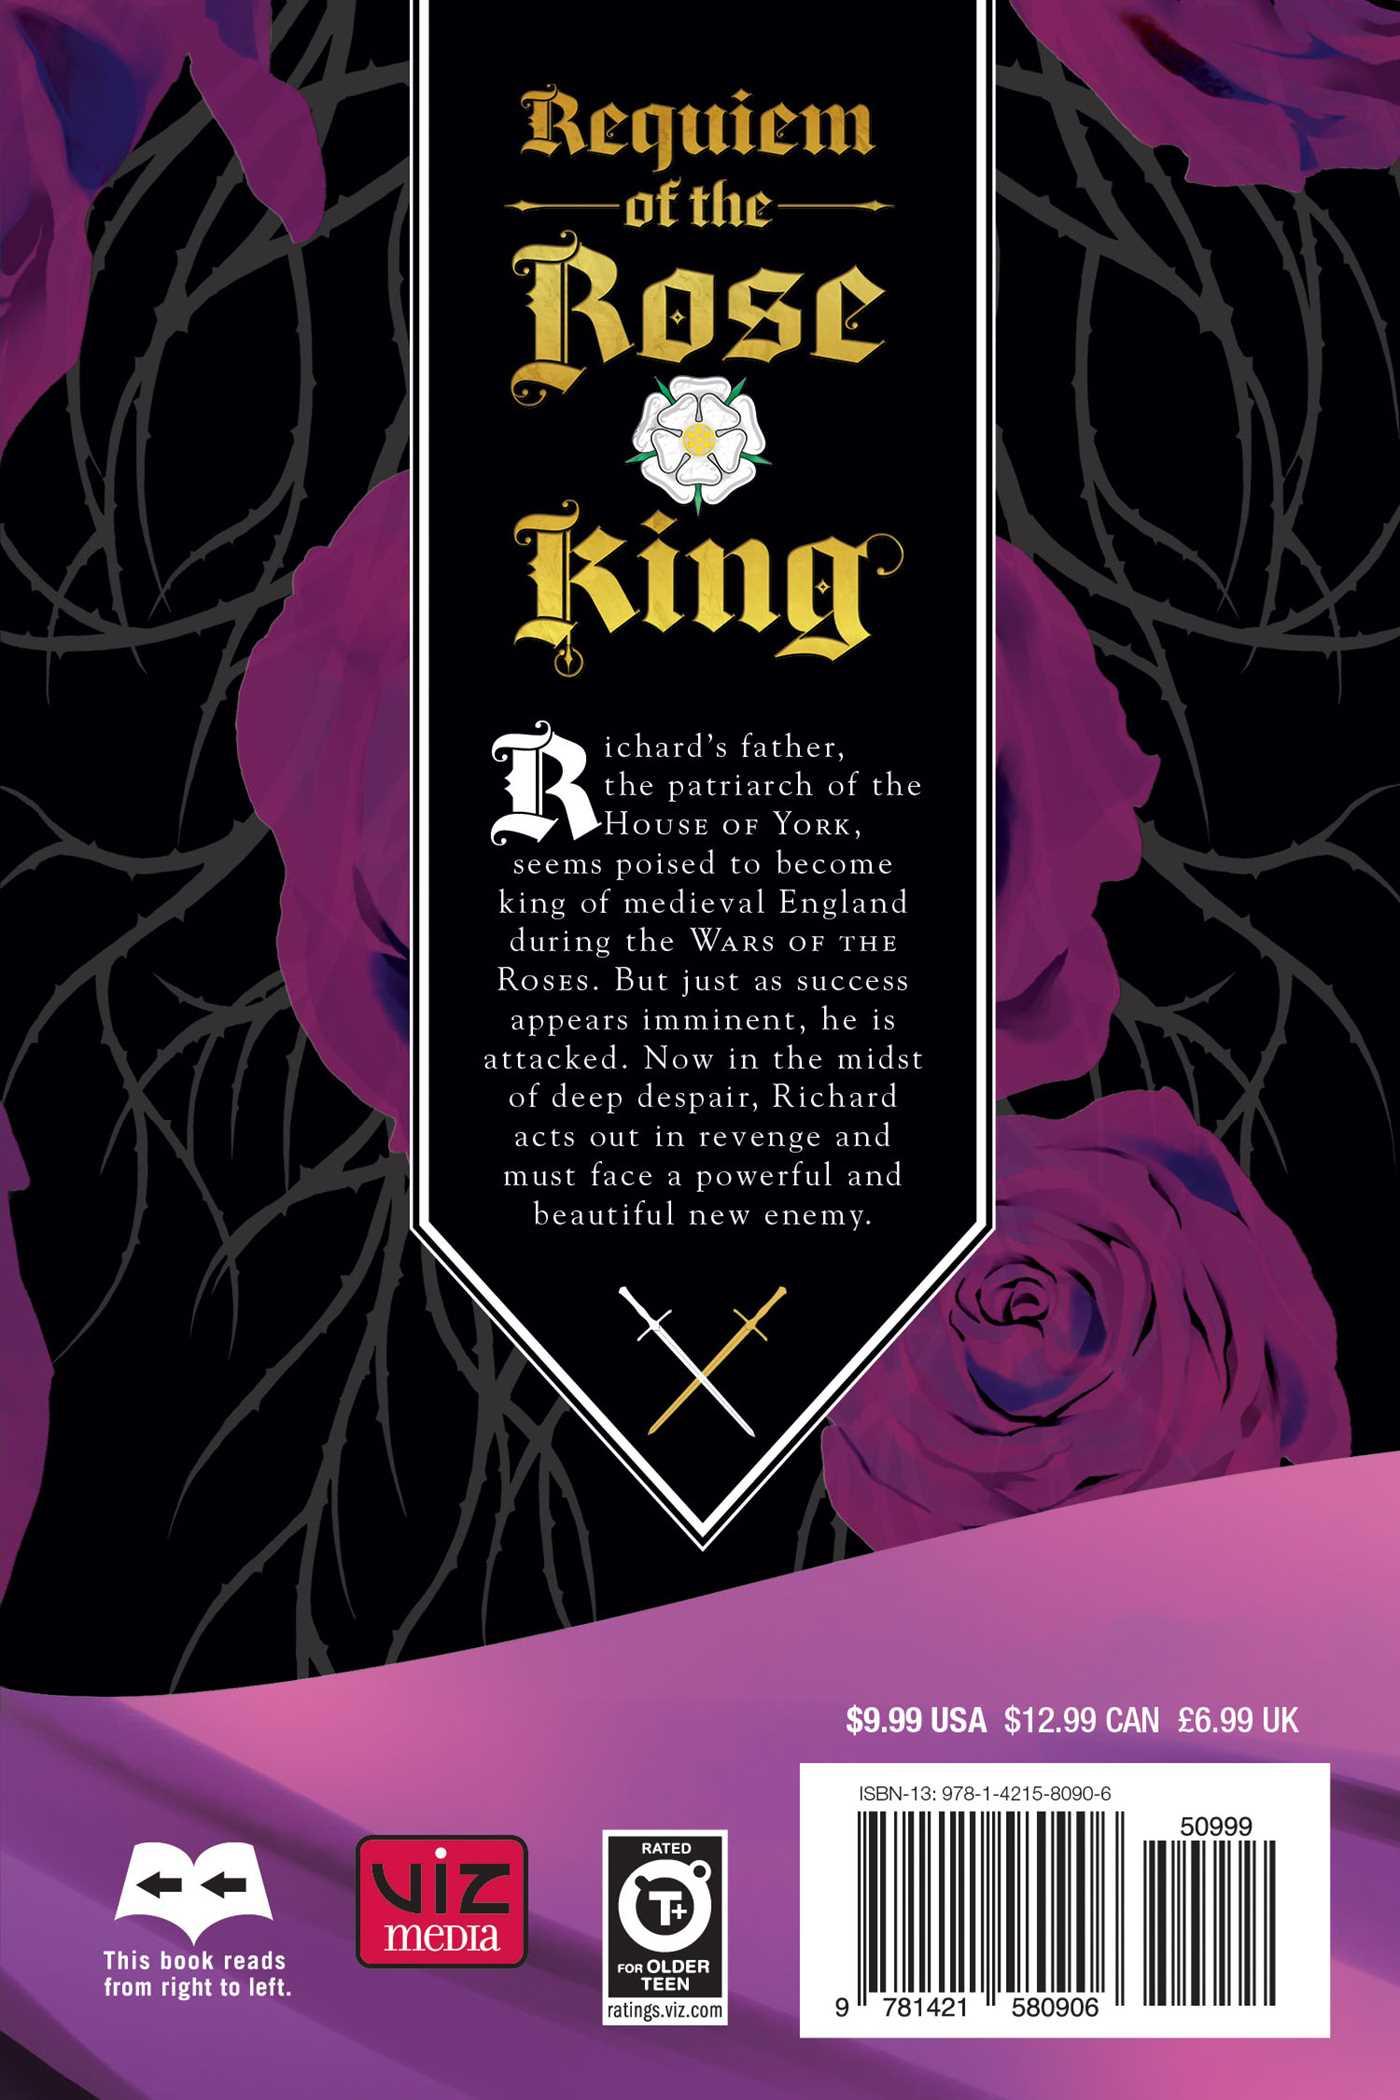 Requiem of the rose king vol 2 9781421580906 hr back